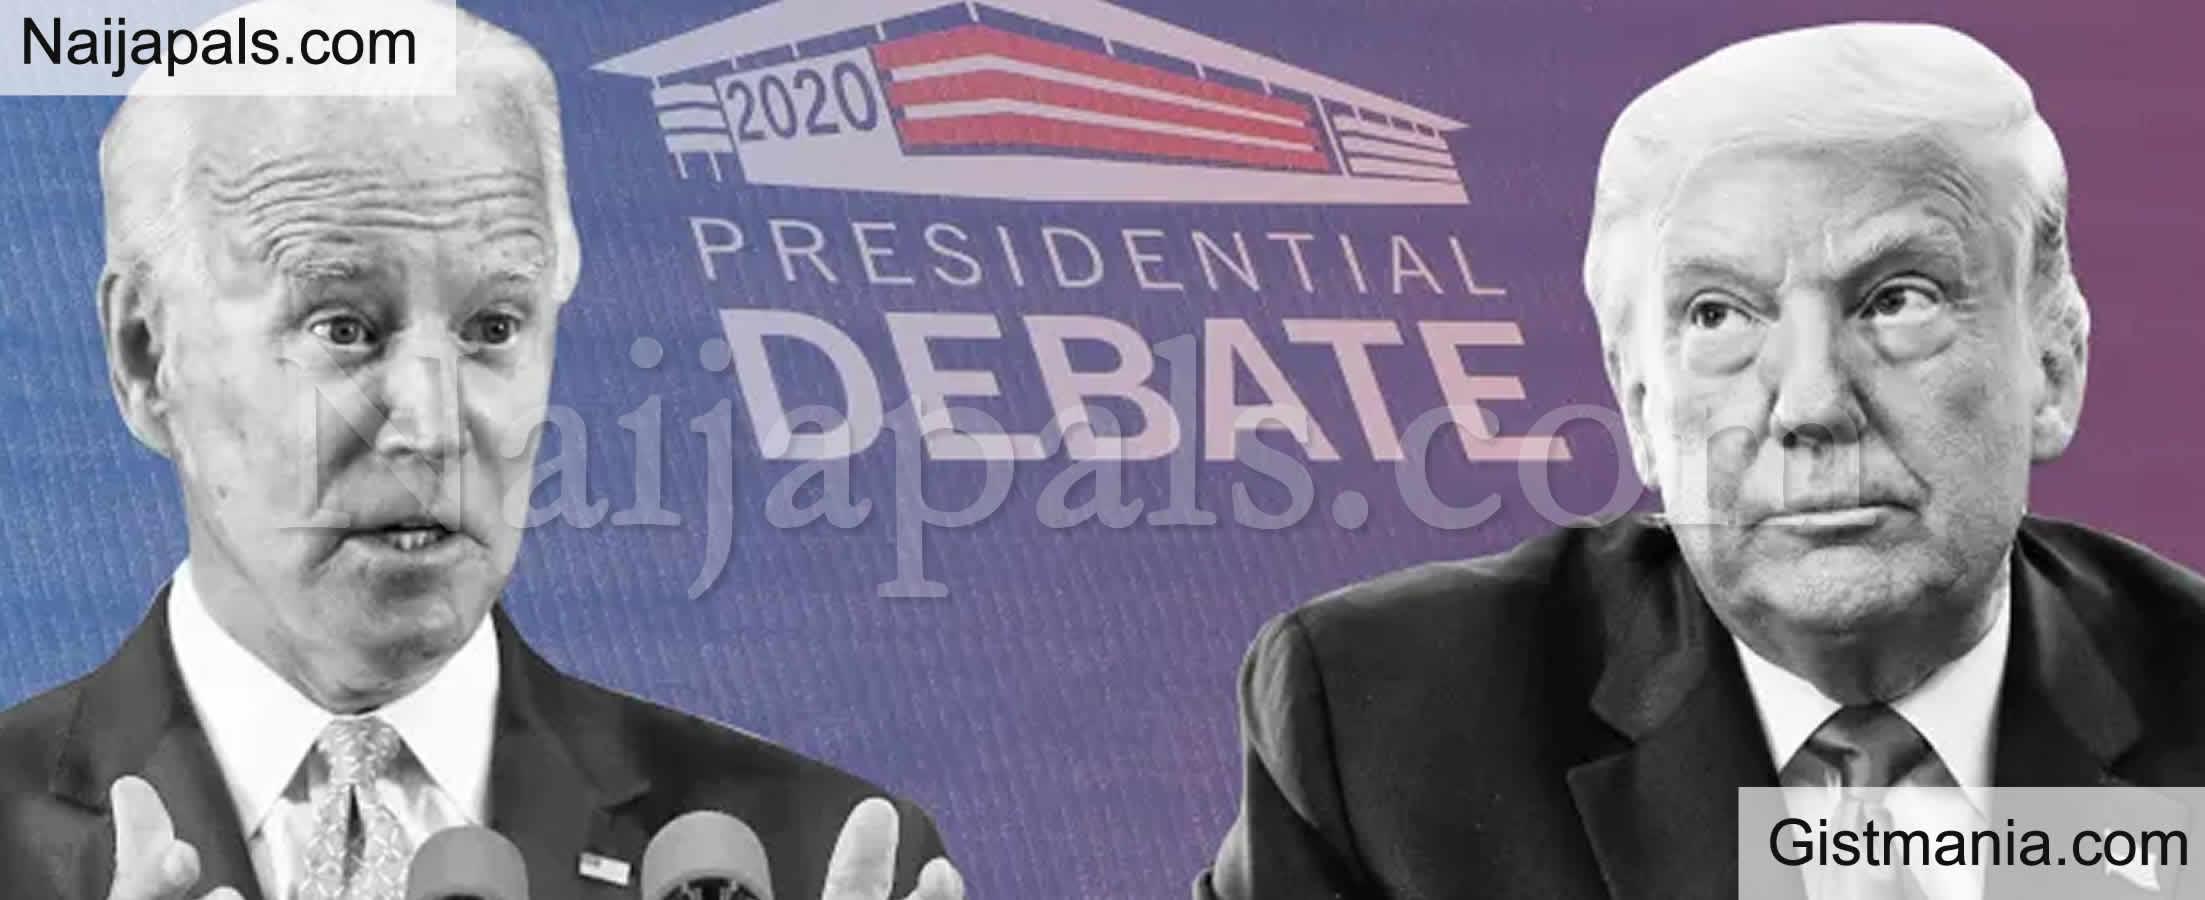 <img alt='.' class='lazyload' data-src='https://img.gistmania.com/emot/news.gif' /> <b>Highlights From The First USA Presidential Debate By Donald Trump and Joe Biden</b>